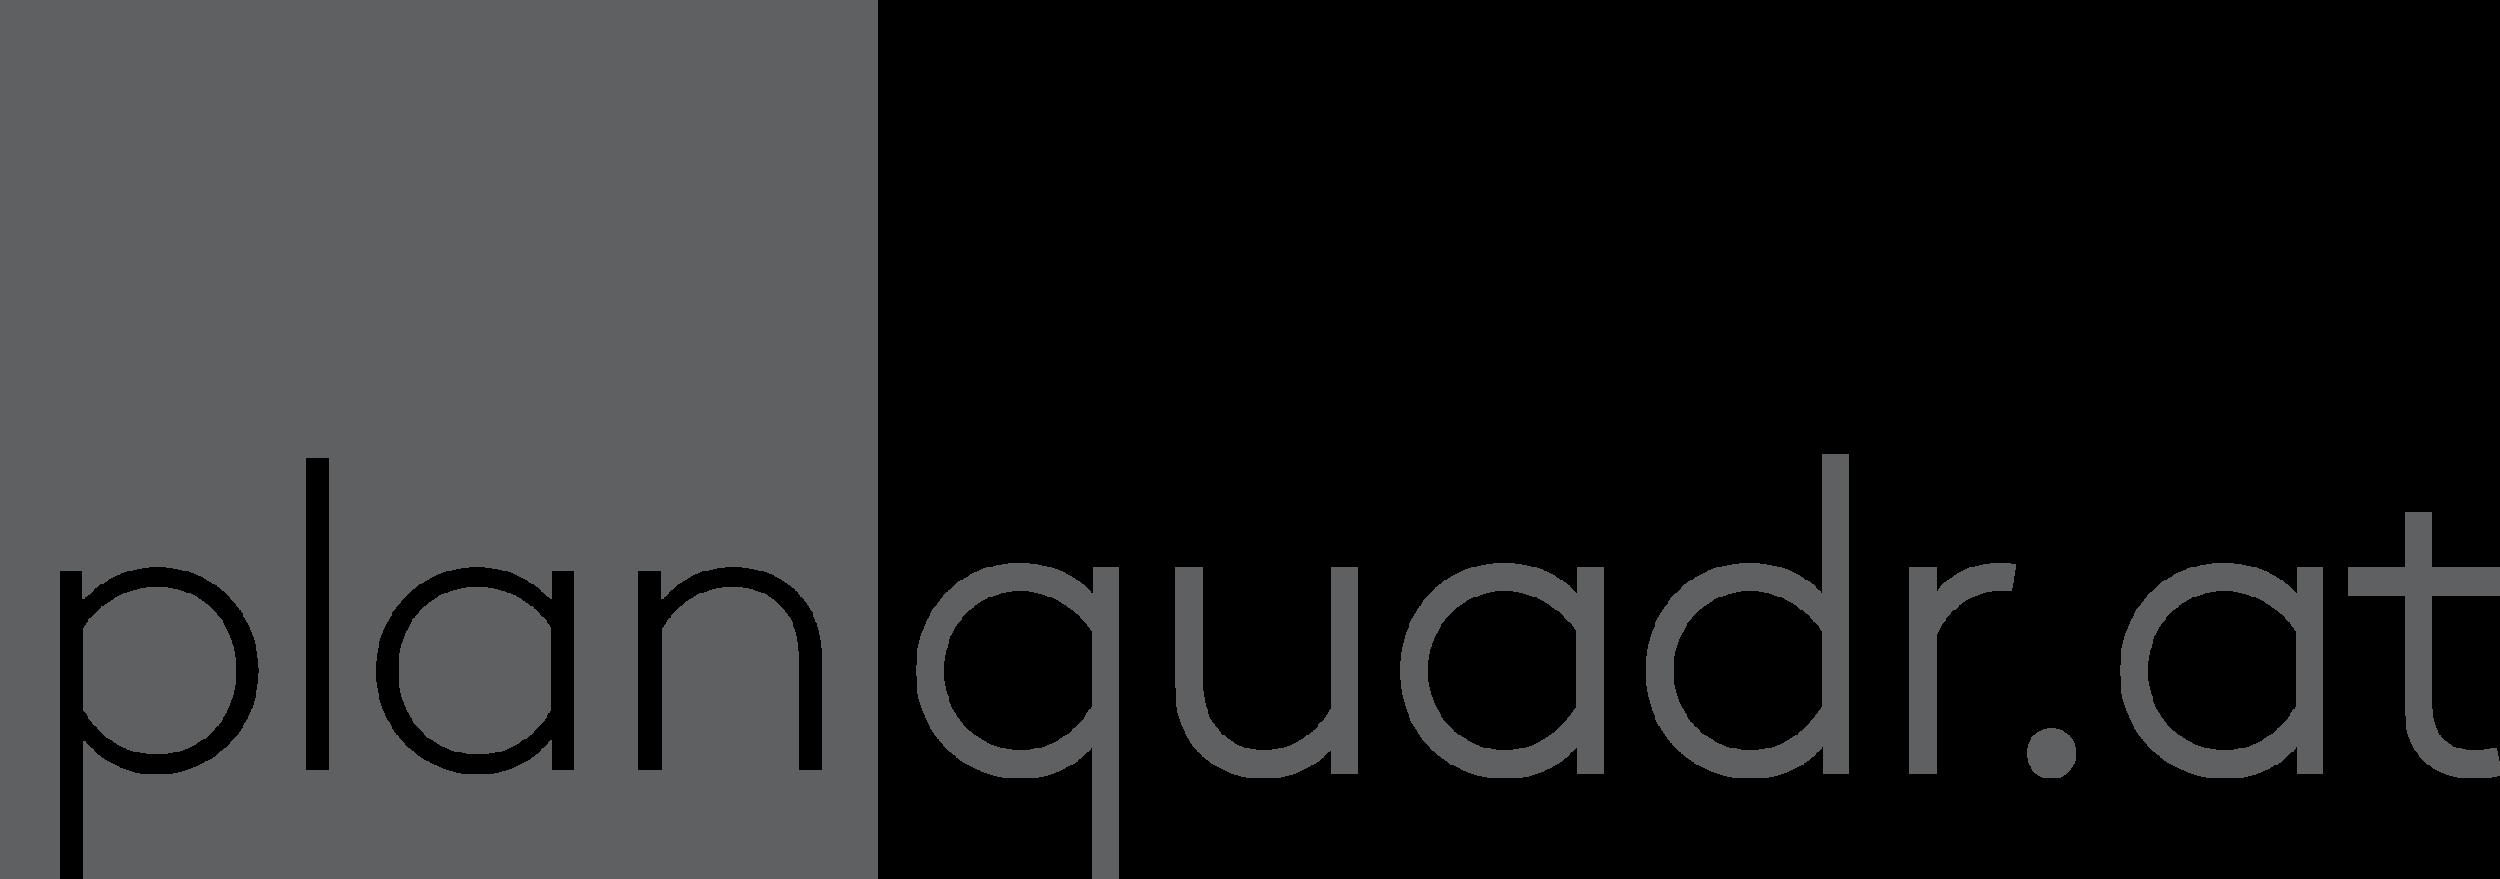 planquadrat_logo